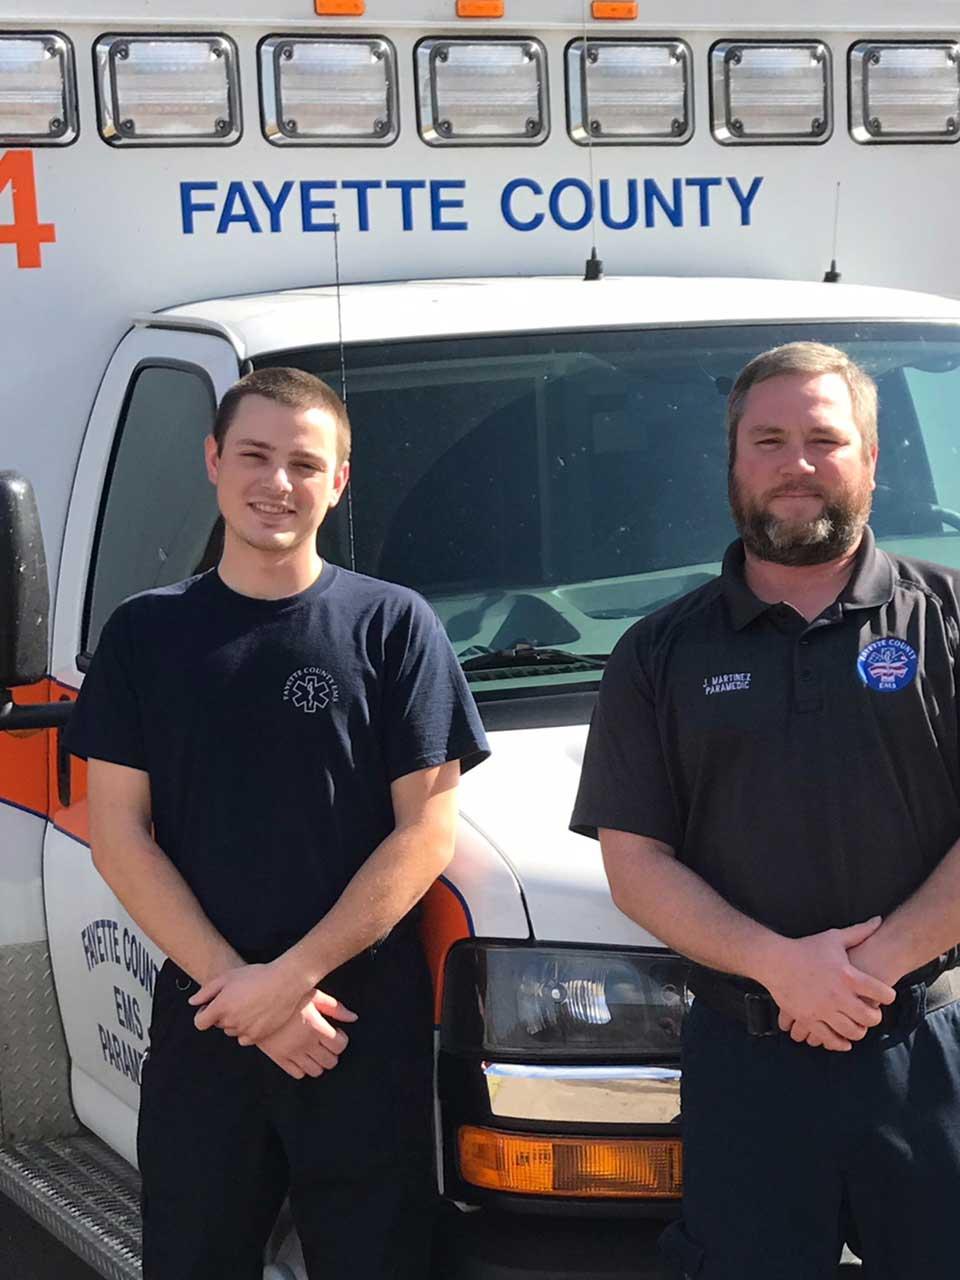 EMS/AmbulanceRossville - B Shift